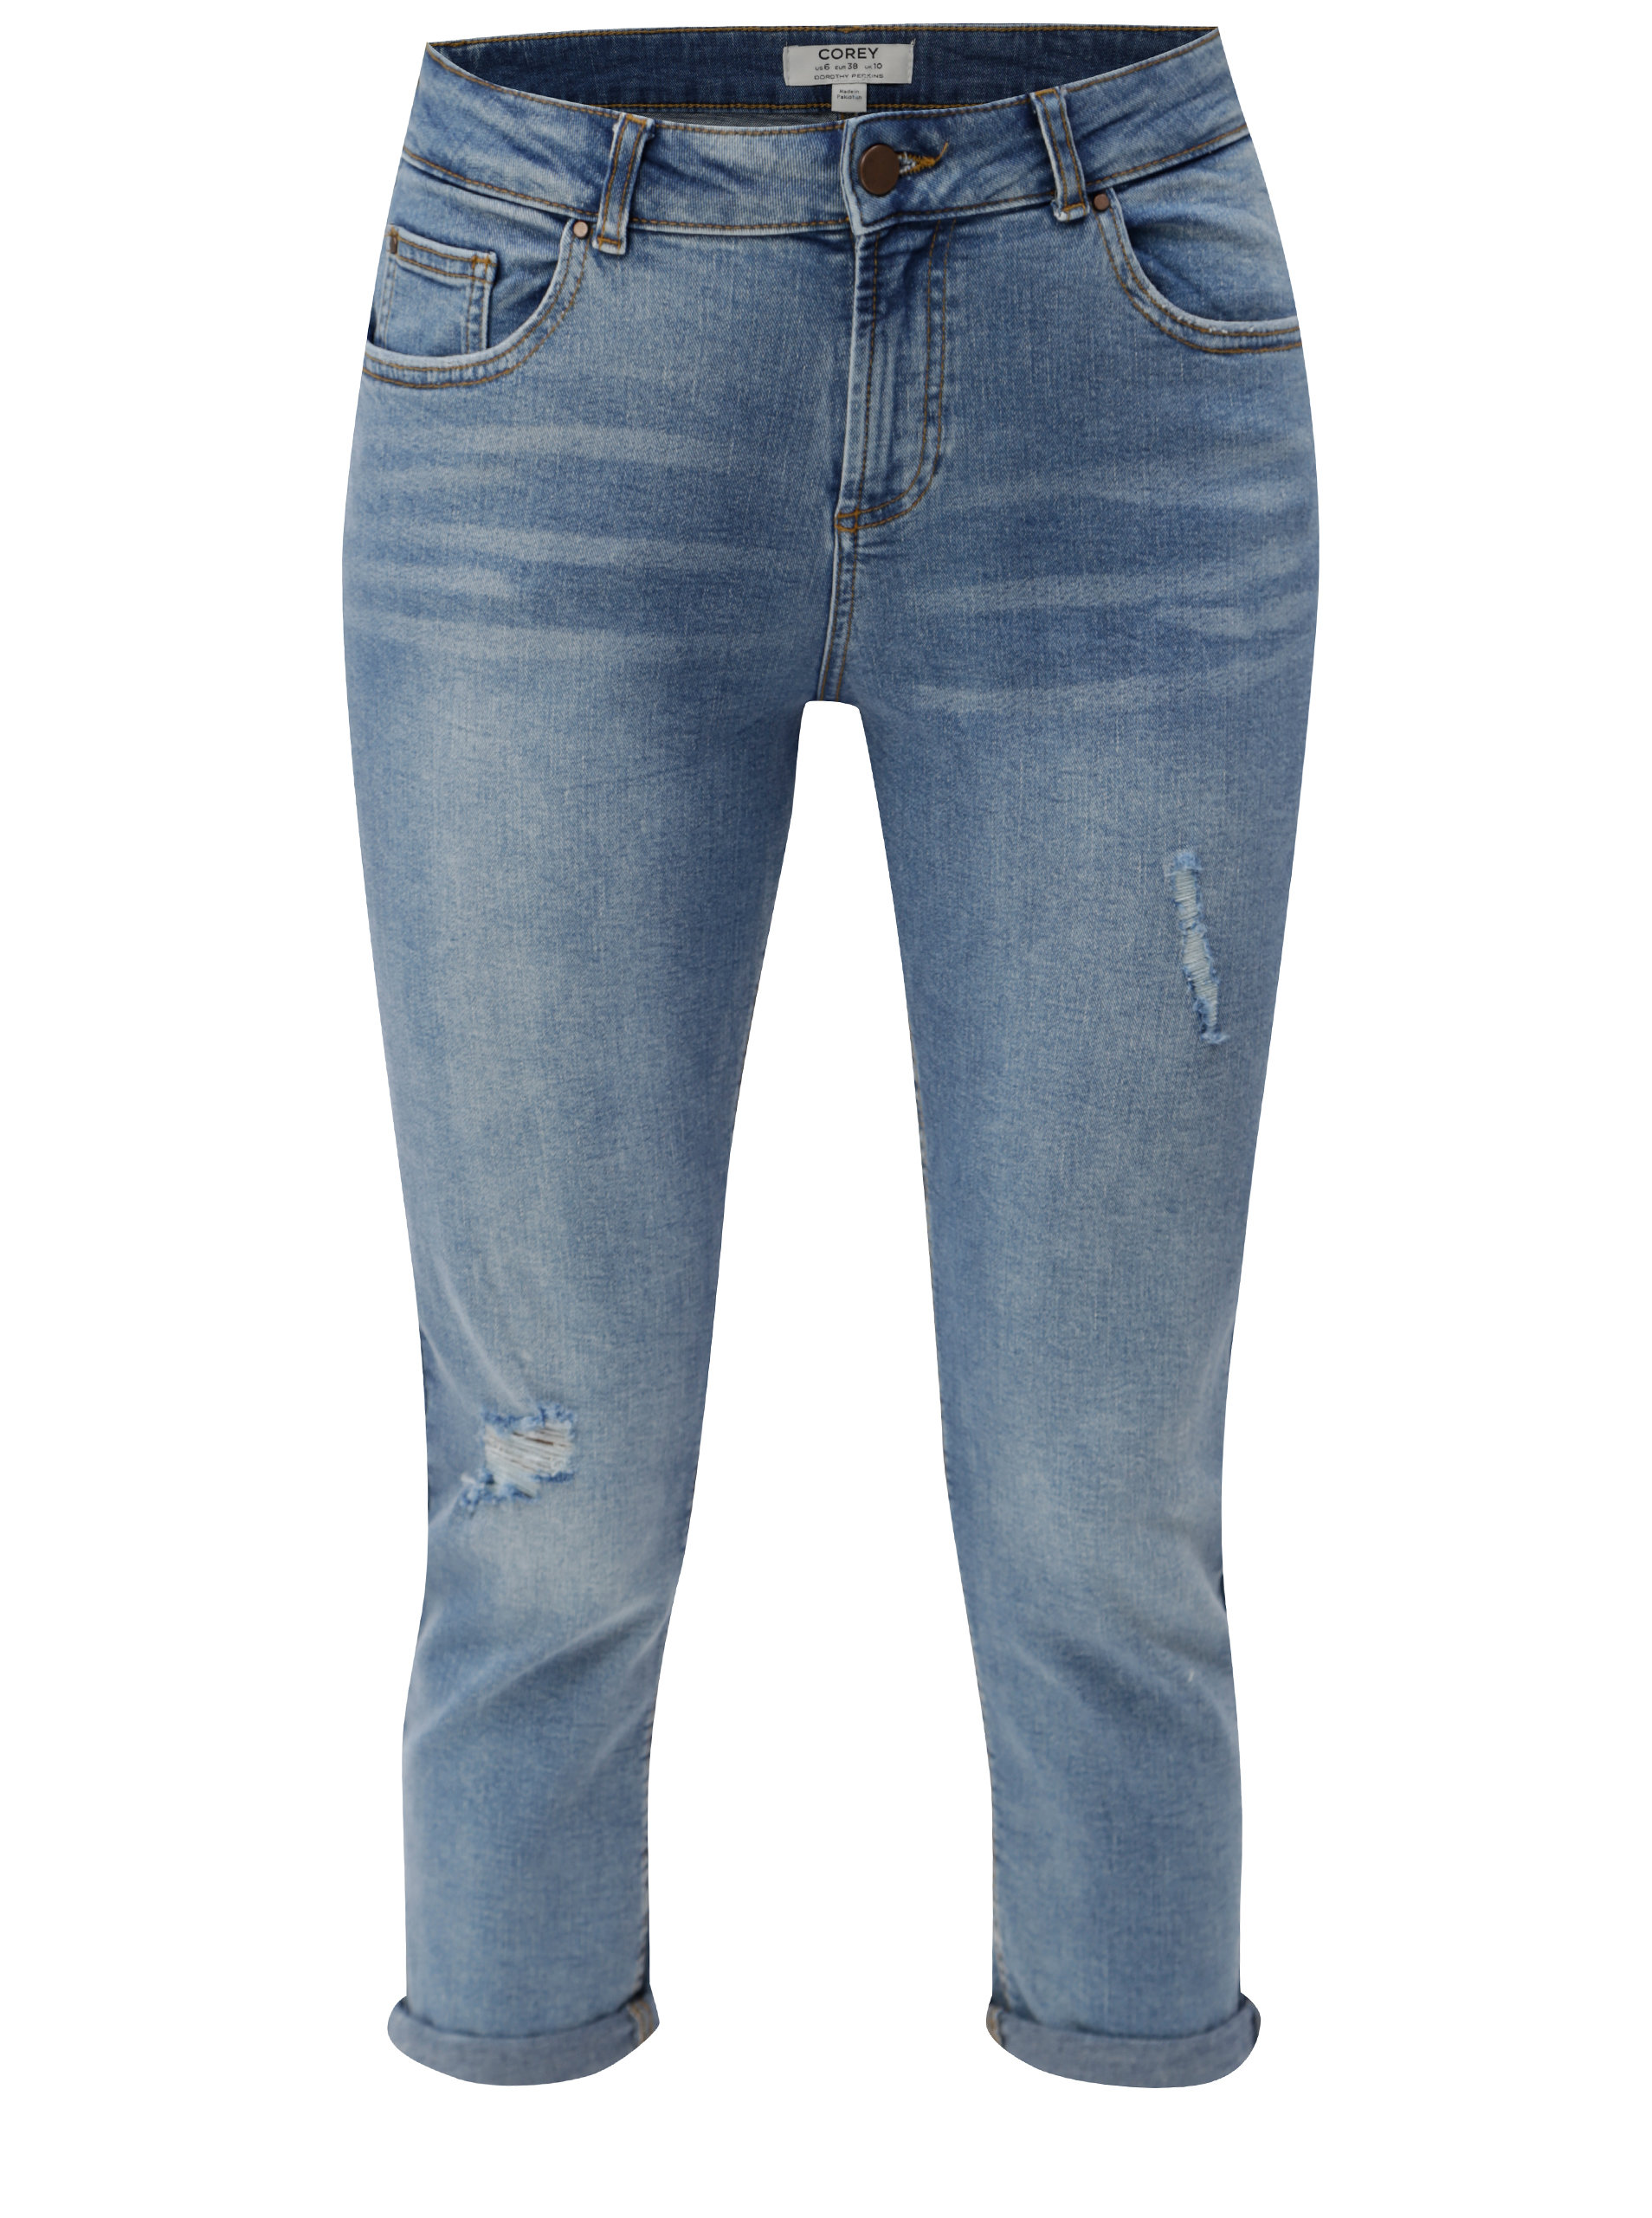 8762e8069393 Modré 3 4 slim džíny s potrhaným efektem Dorothy Perkins